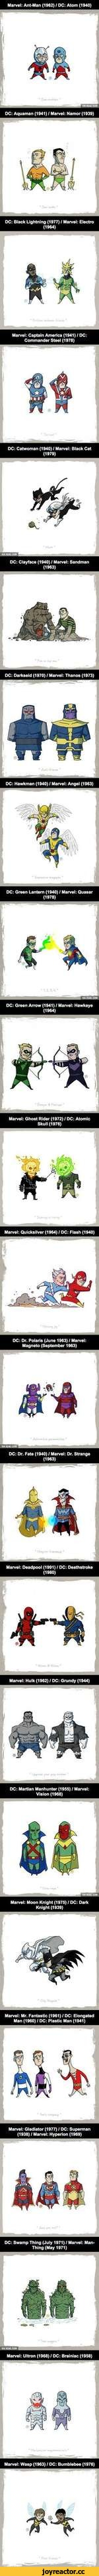 Marvel: Ant-Man (1962) / DC: Atom (1940) EU DC: Aquaman (1941) I Marvel: Namor (1939) Marvel: Captain America (1941) / DC: Commander Steel (1978) DC: Catwoman (1940) / Marvel: Black Cat (1979) MKKCW DC: Clayface (1940) / Marvel: Sandman (1963) DC: Darkseid (1970) / Marvel: Thanos (1973) D